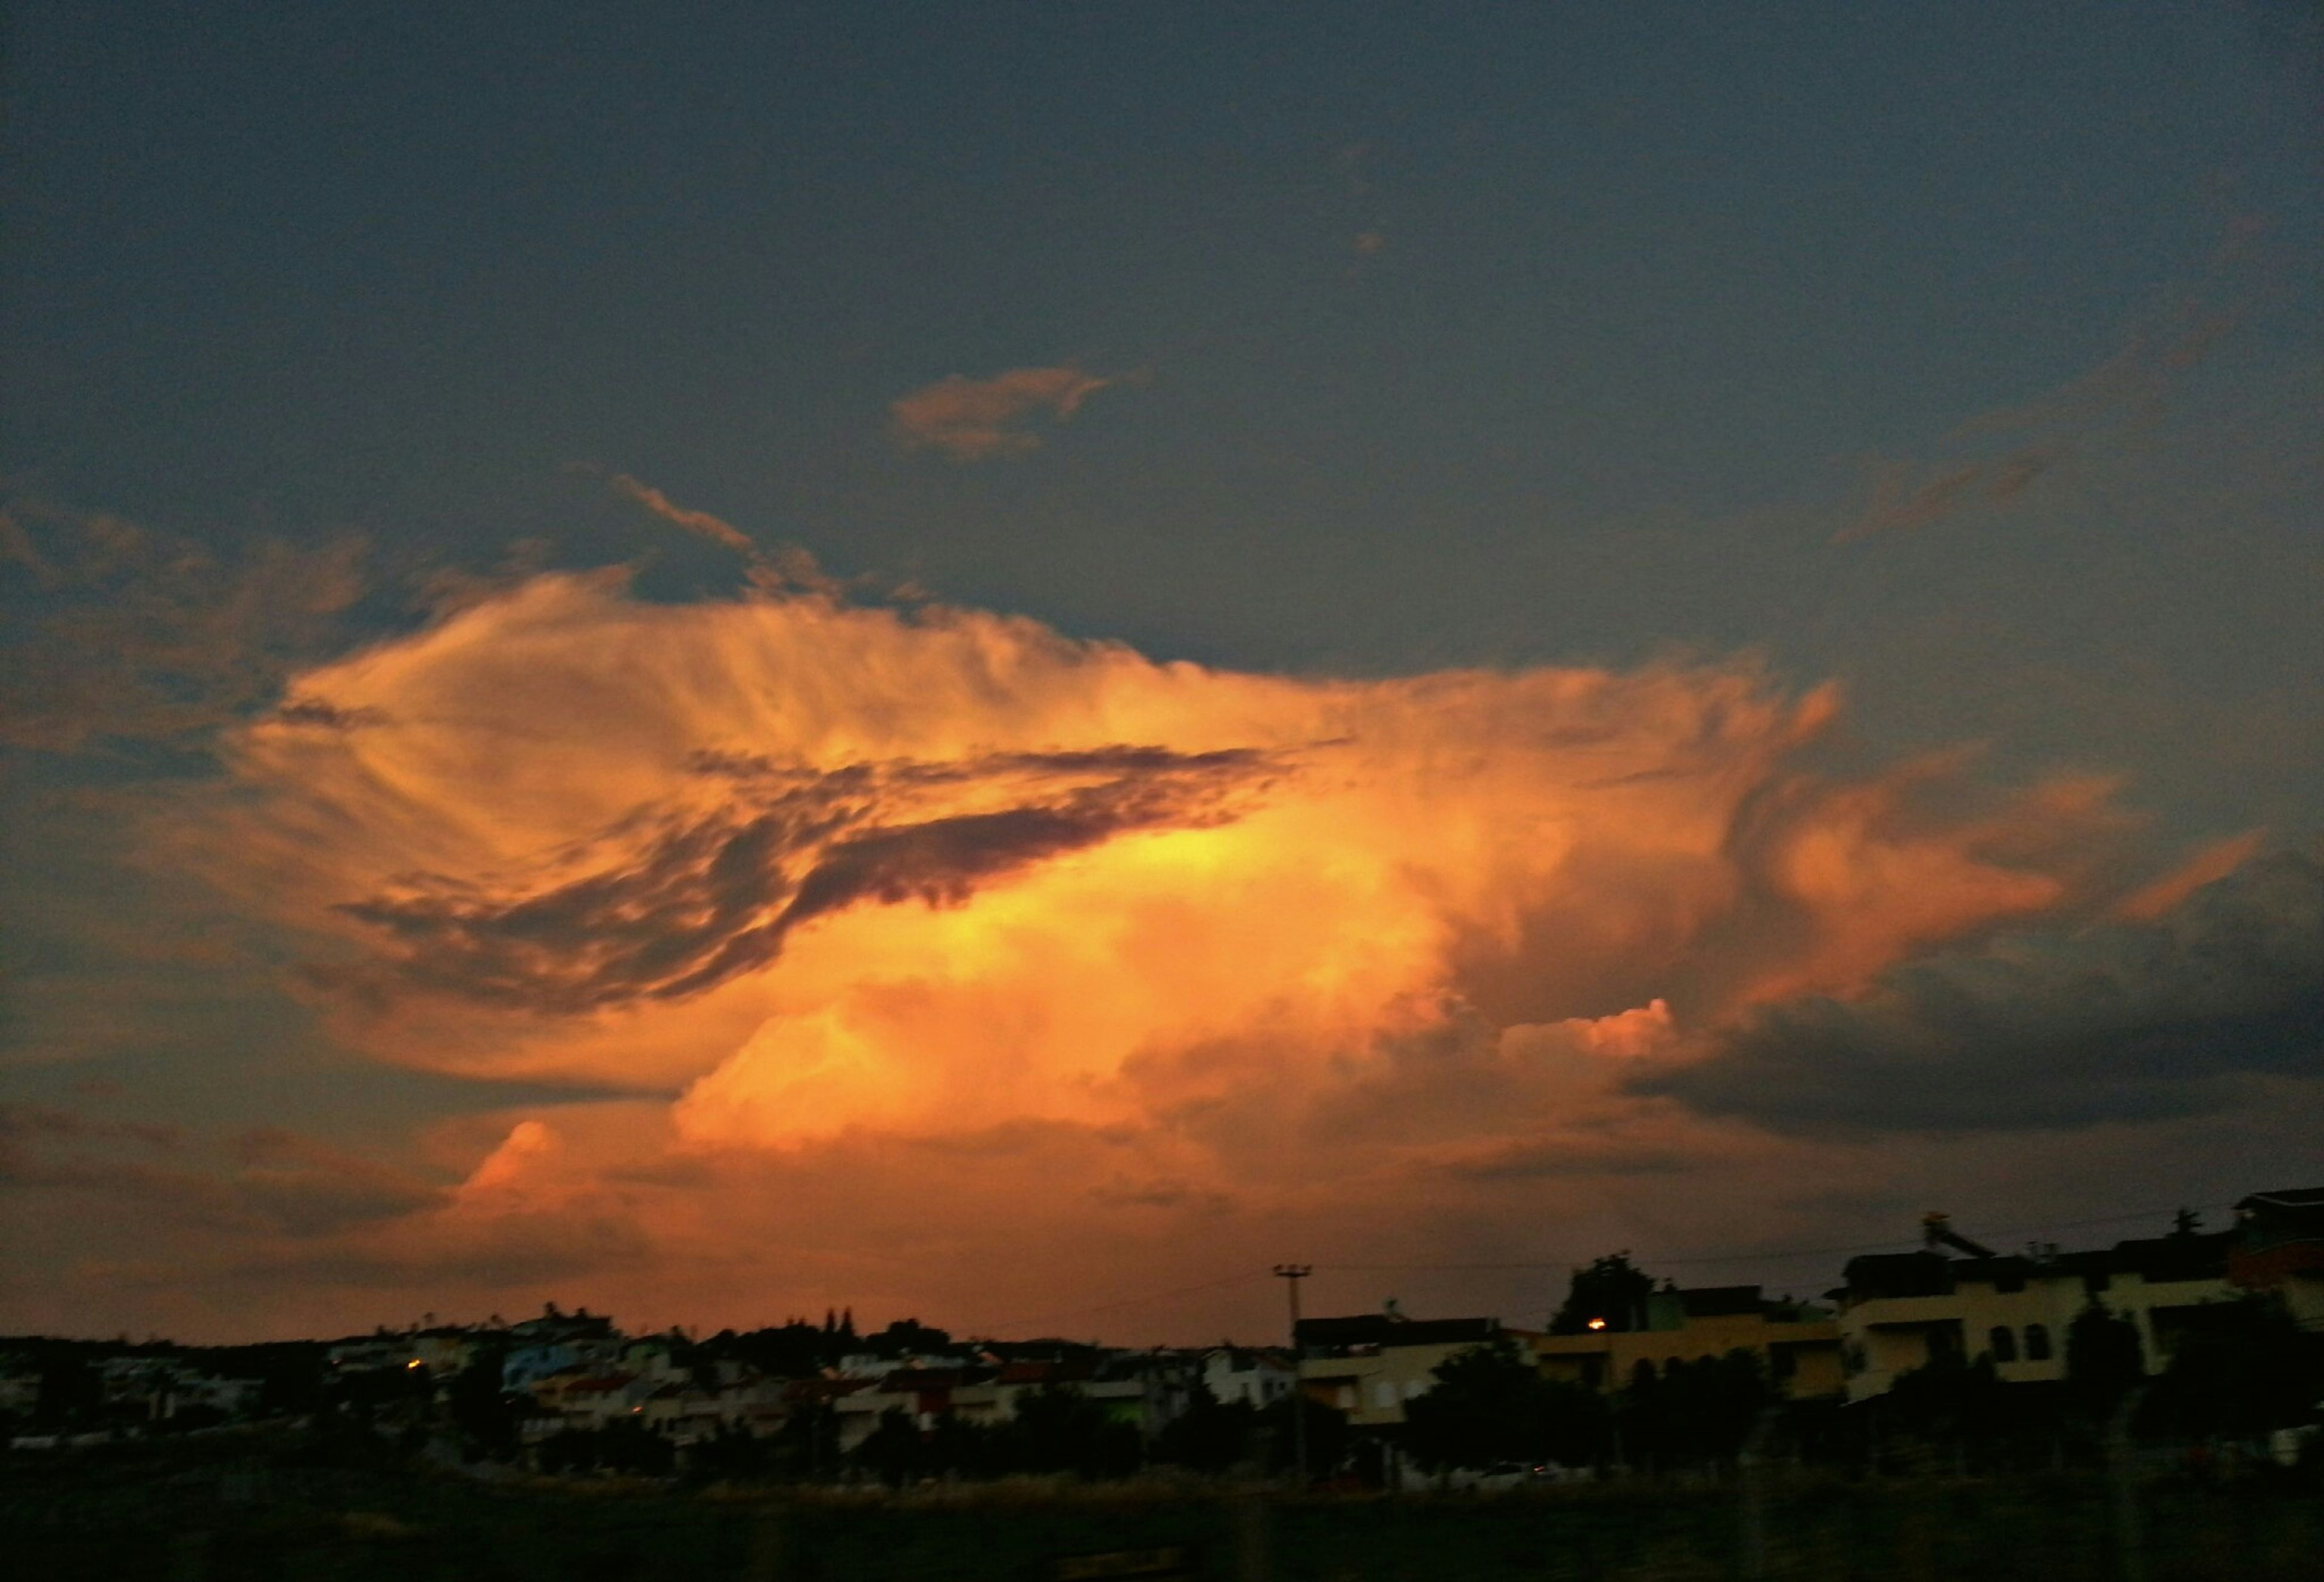 sunset, sky, orange color, cloud - sky, silhouette, scenics, landscape, beauty in nature, building exterior, tranquil scene, built structure, tranquility, dramatic sky, nature, architecture, house, idyllic, cloud, dusk, cloudy